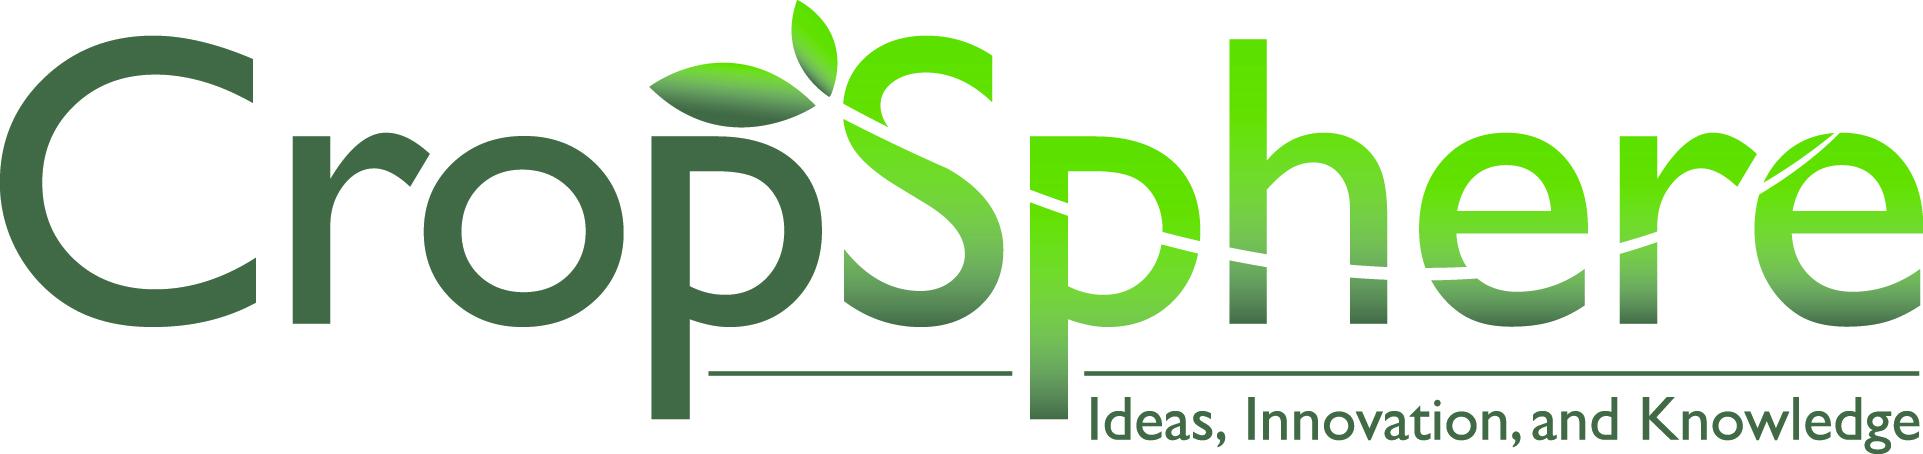 CropSphere Logo 600